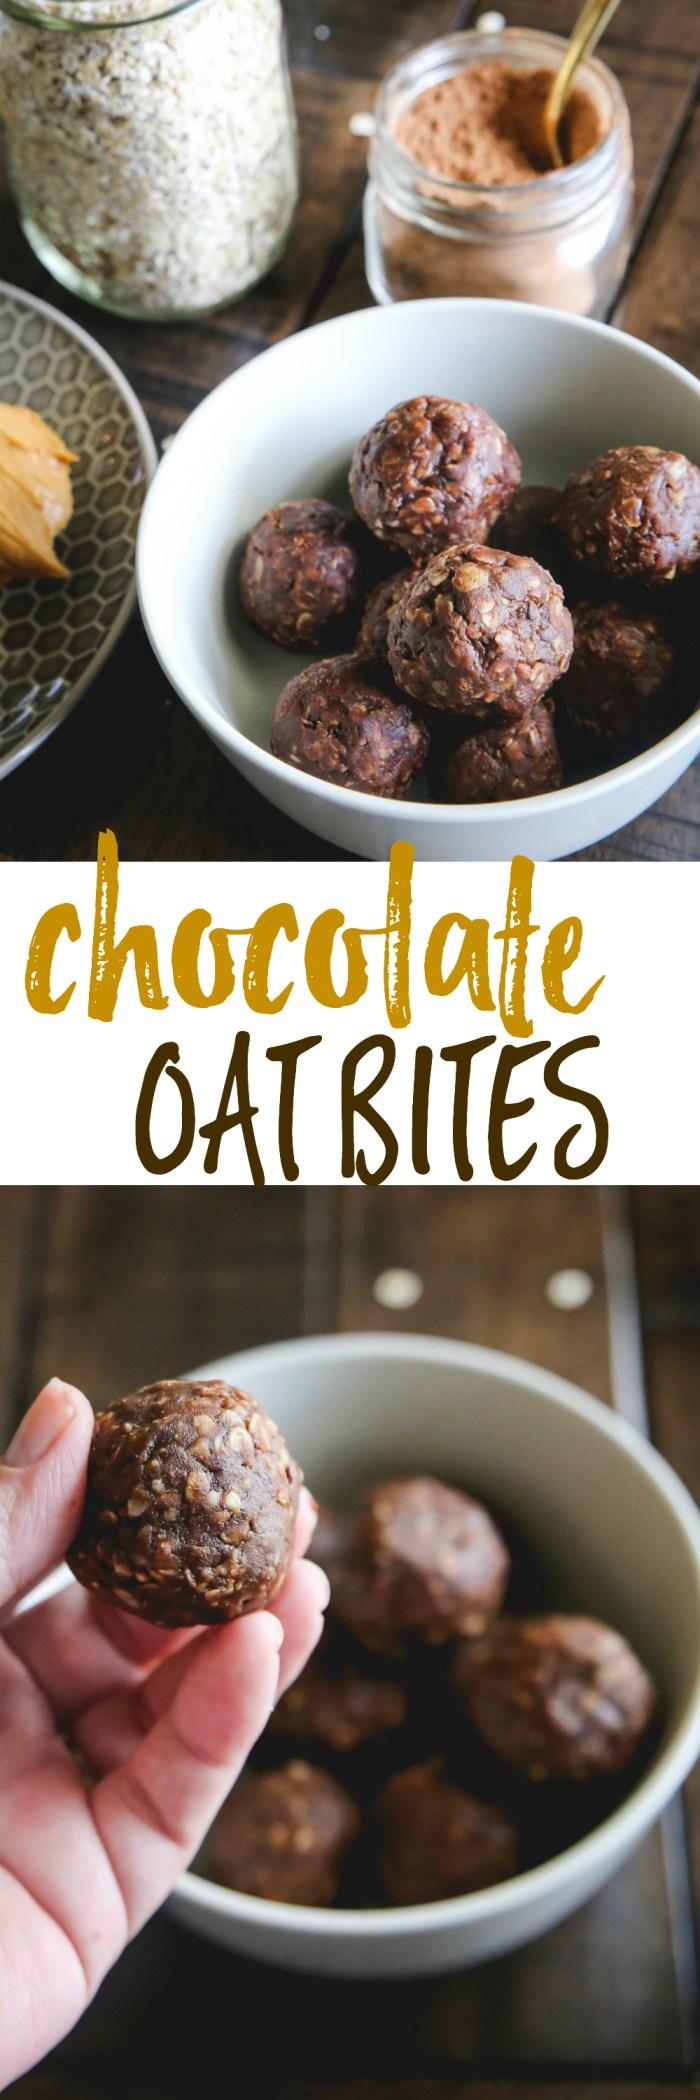 chocolate oat bites